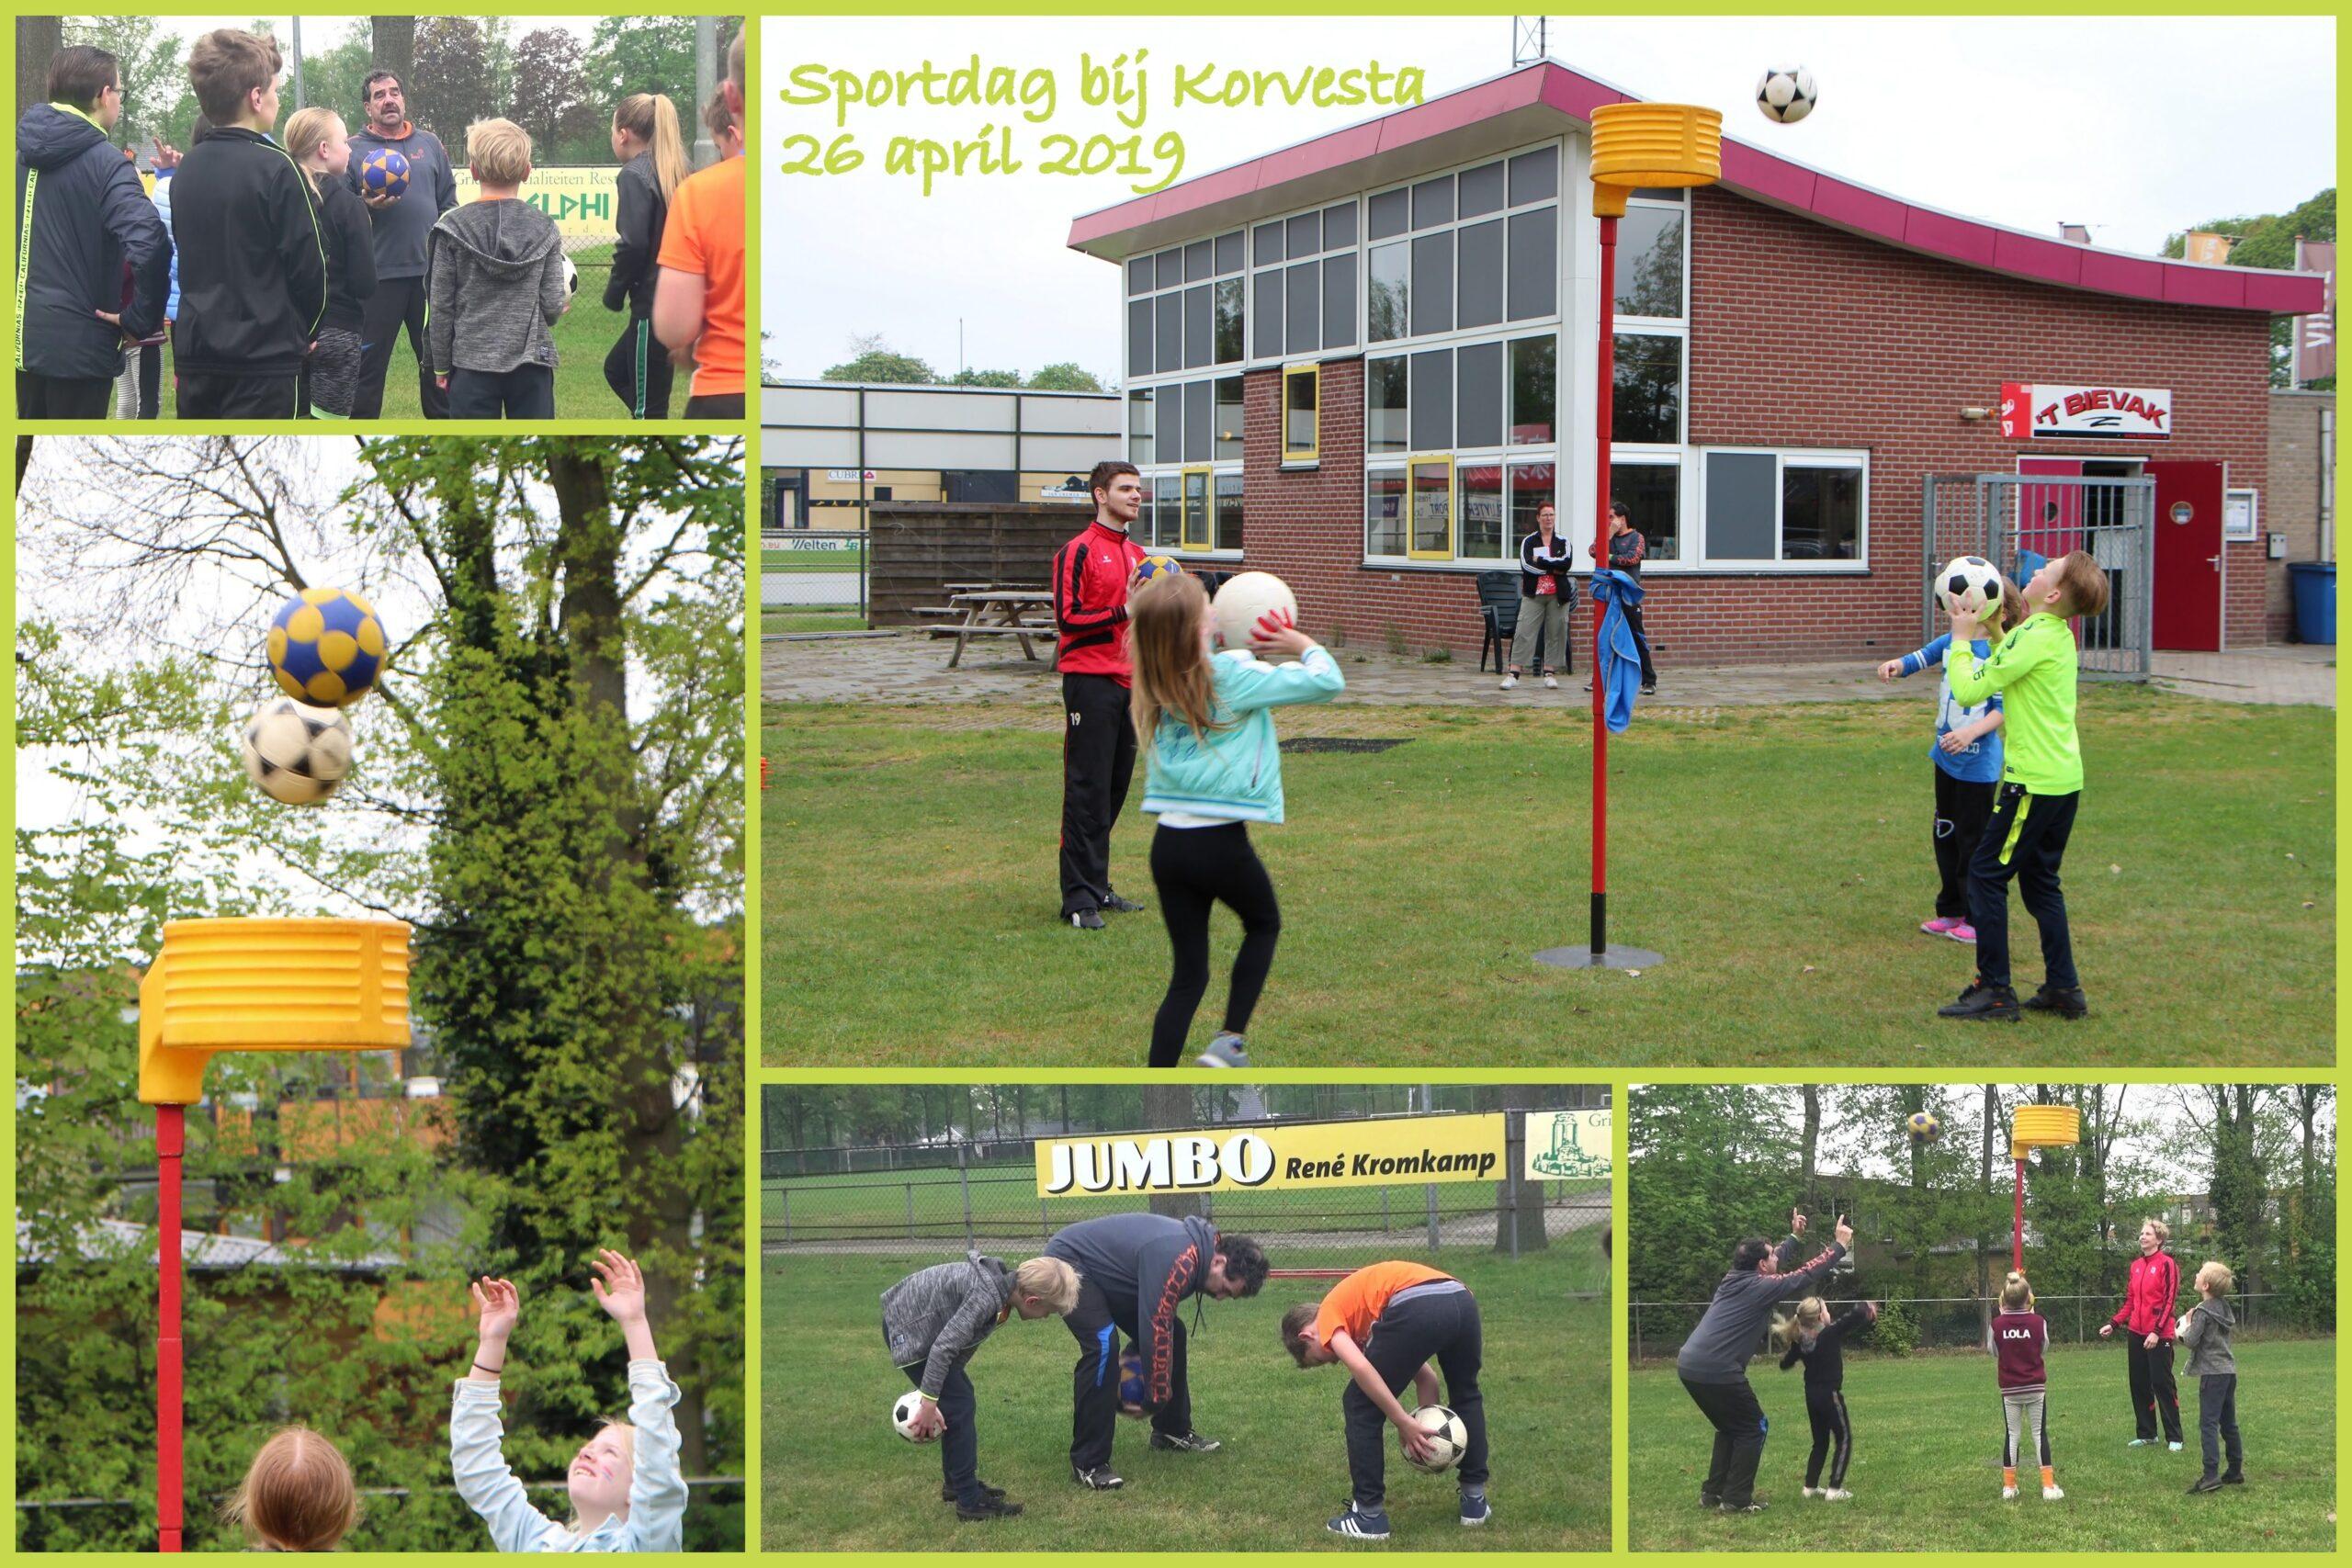 Collage Sportdag bij Korvesta